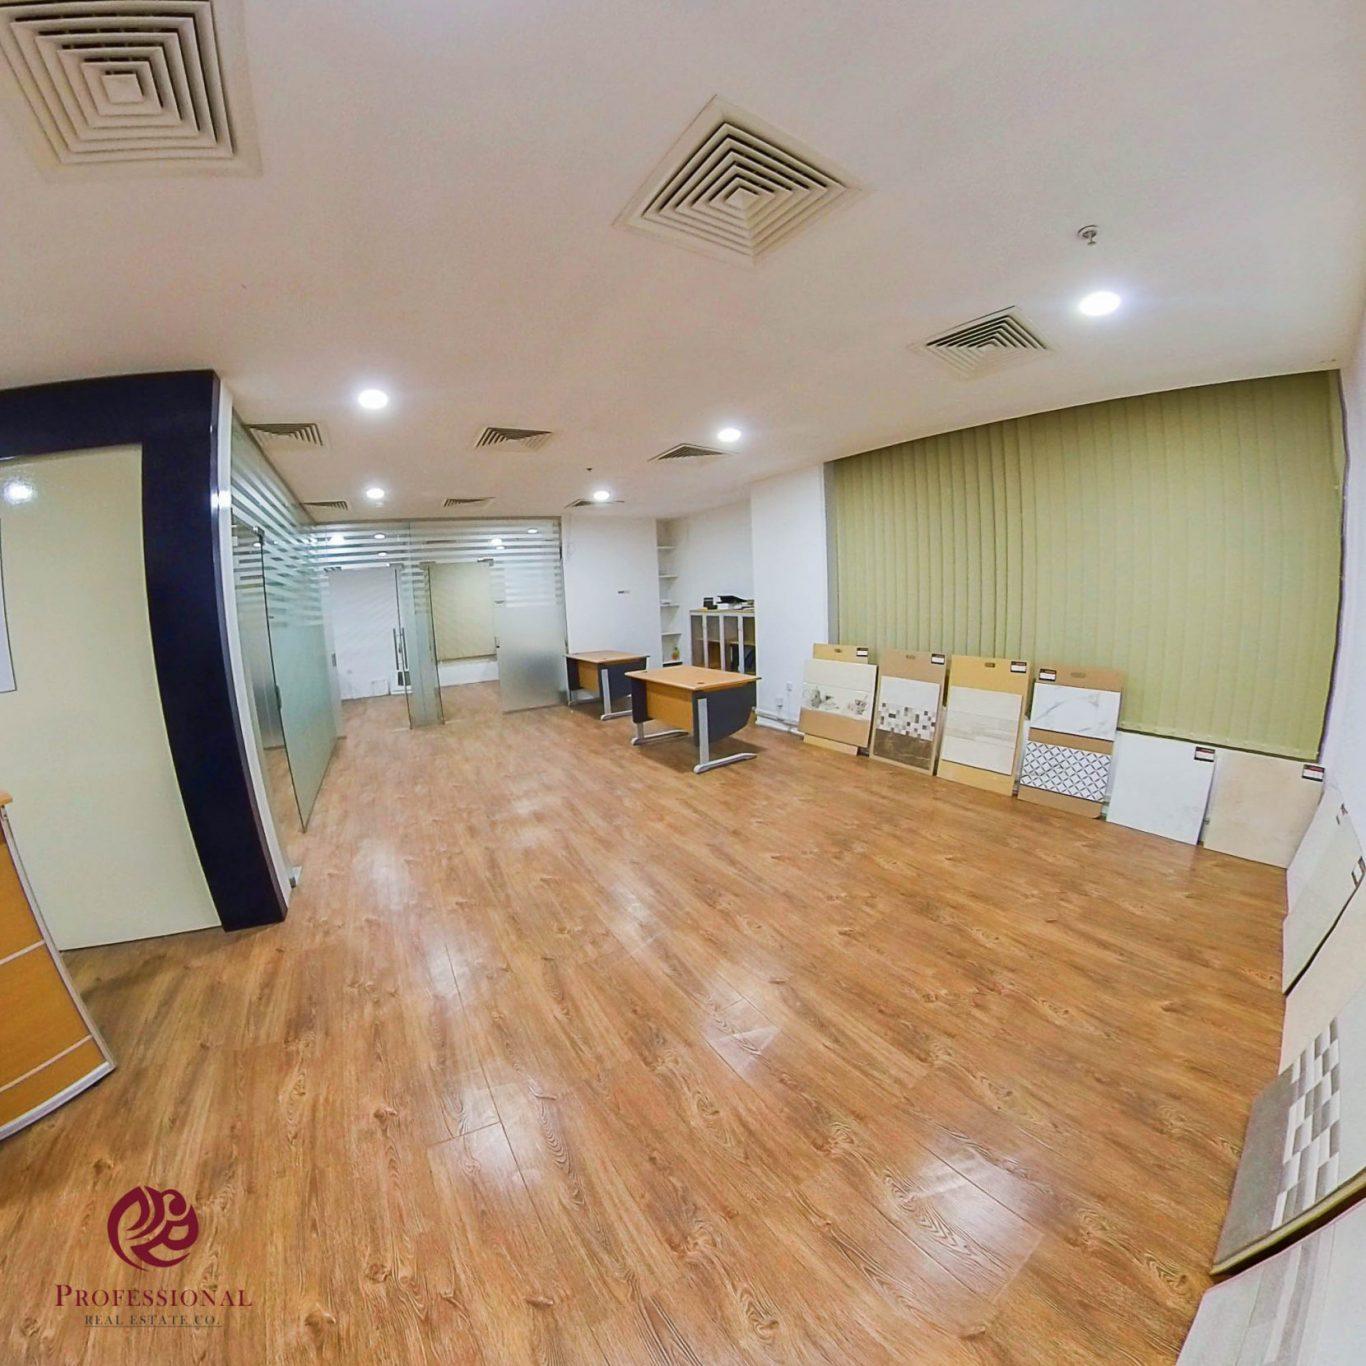 Unfurnished, 86 SQM  Office Space in Al Sadd